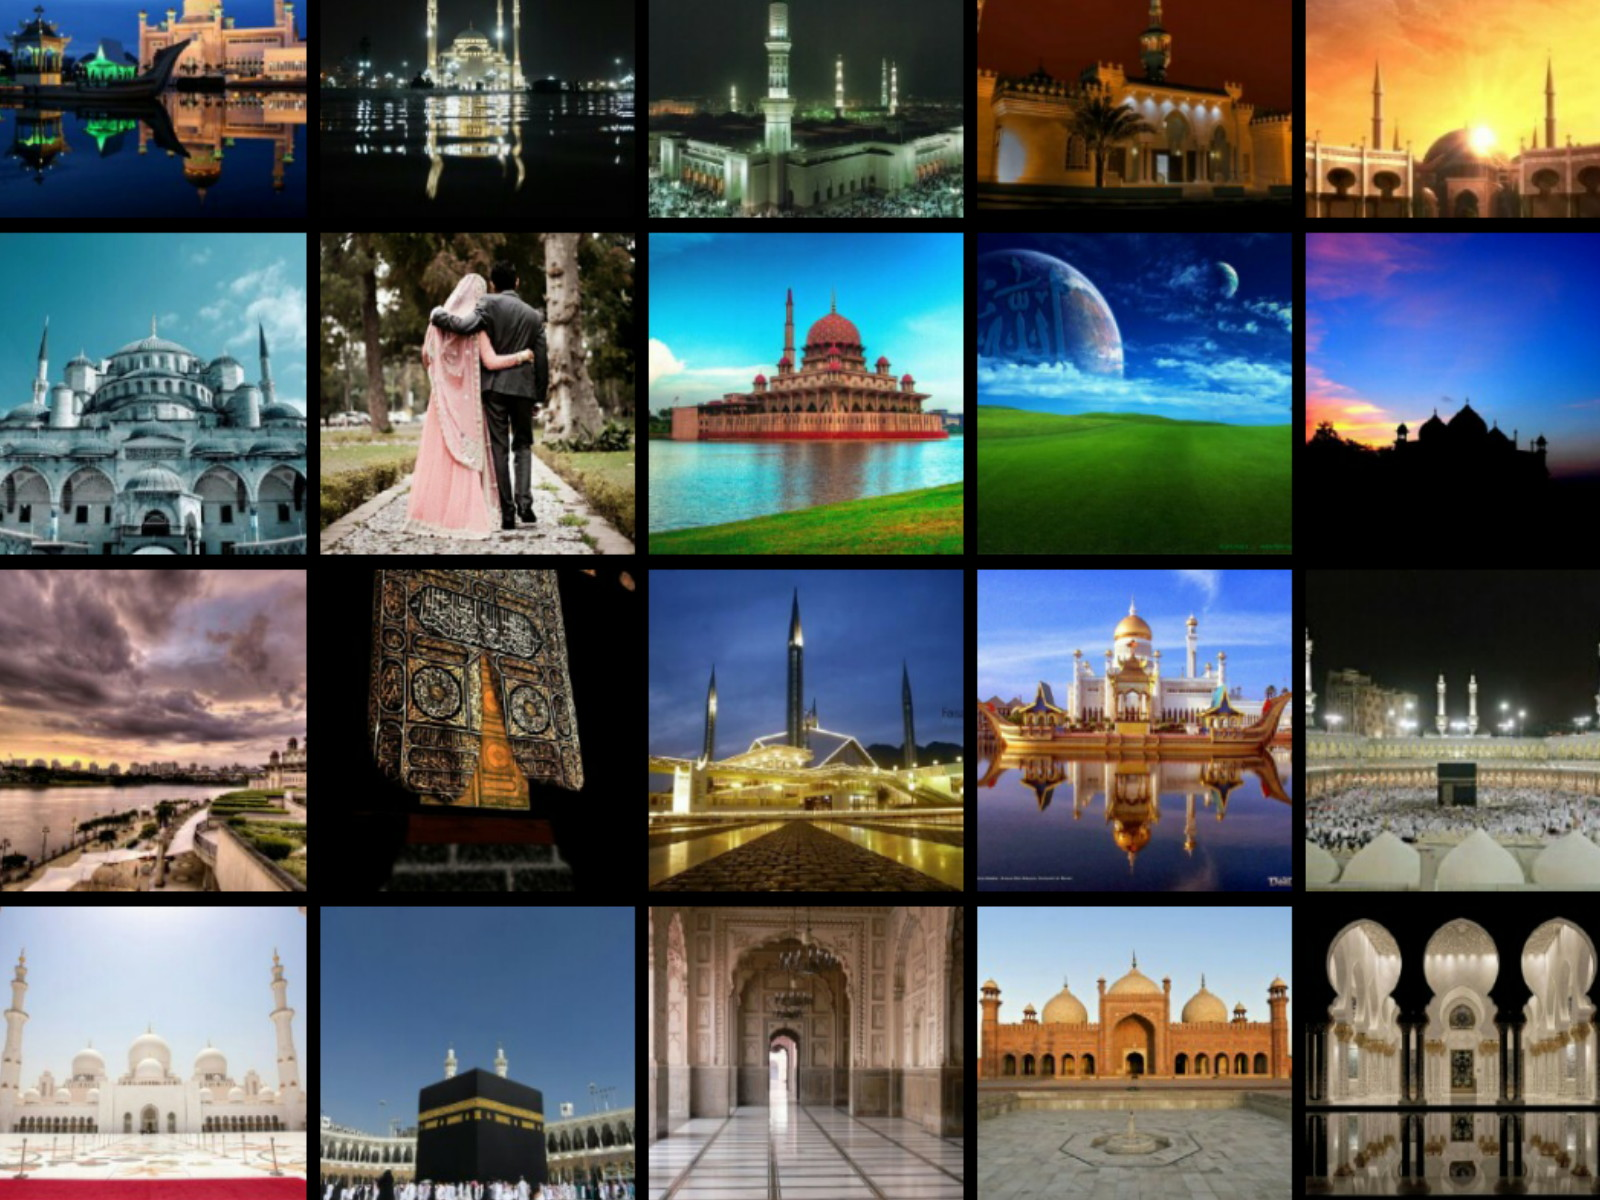 Download 68+ Background Islami Kualitas Hd HD Gratis